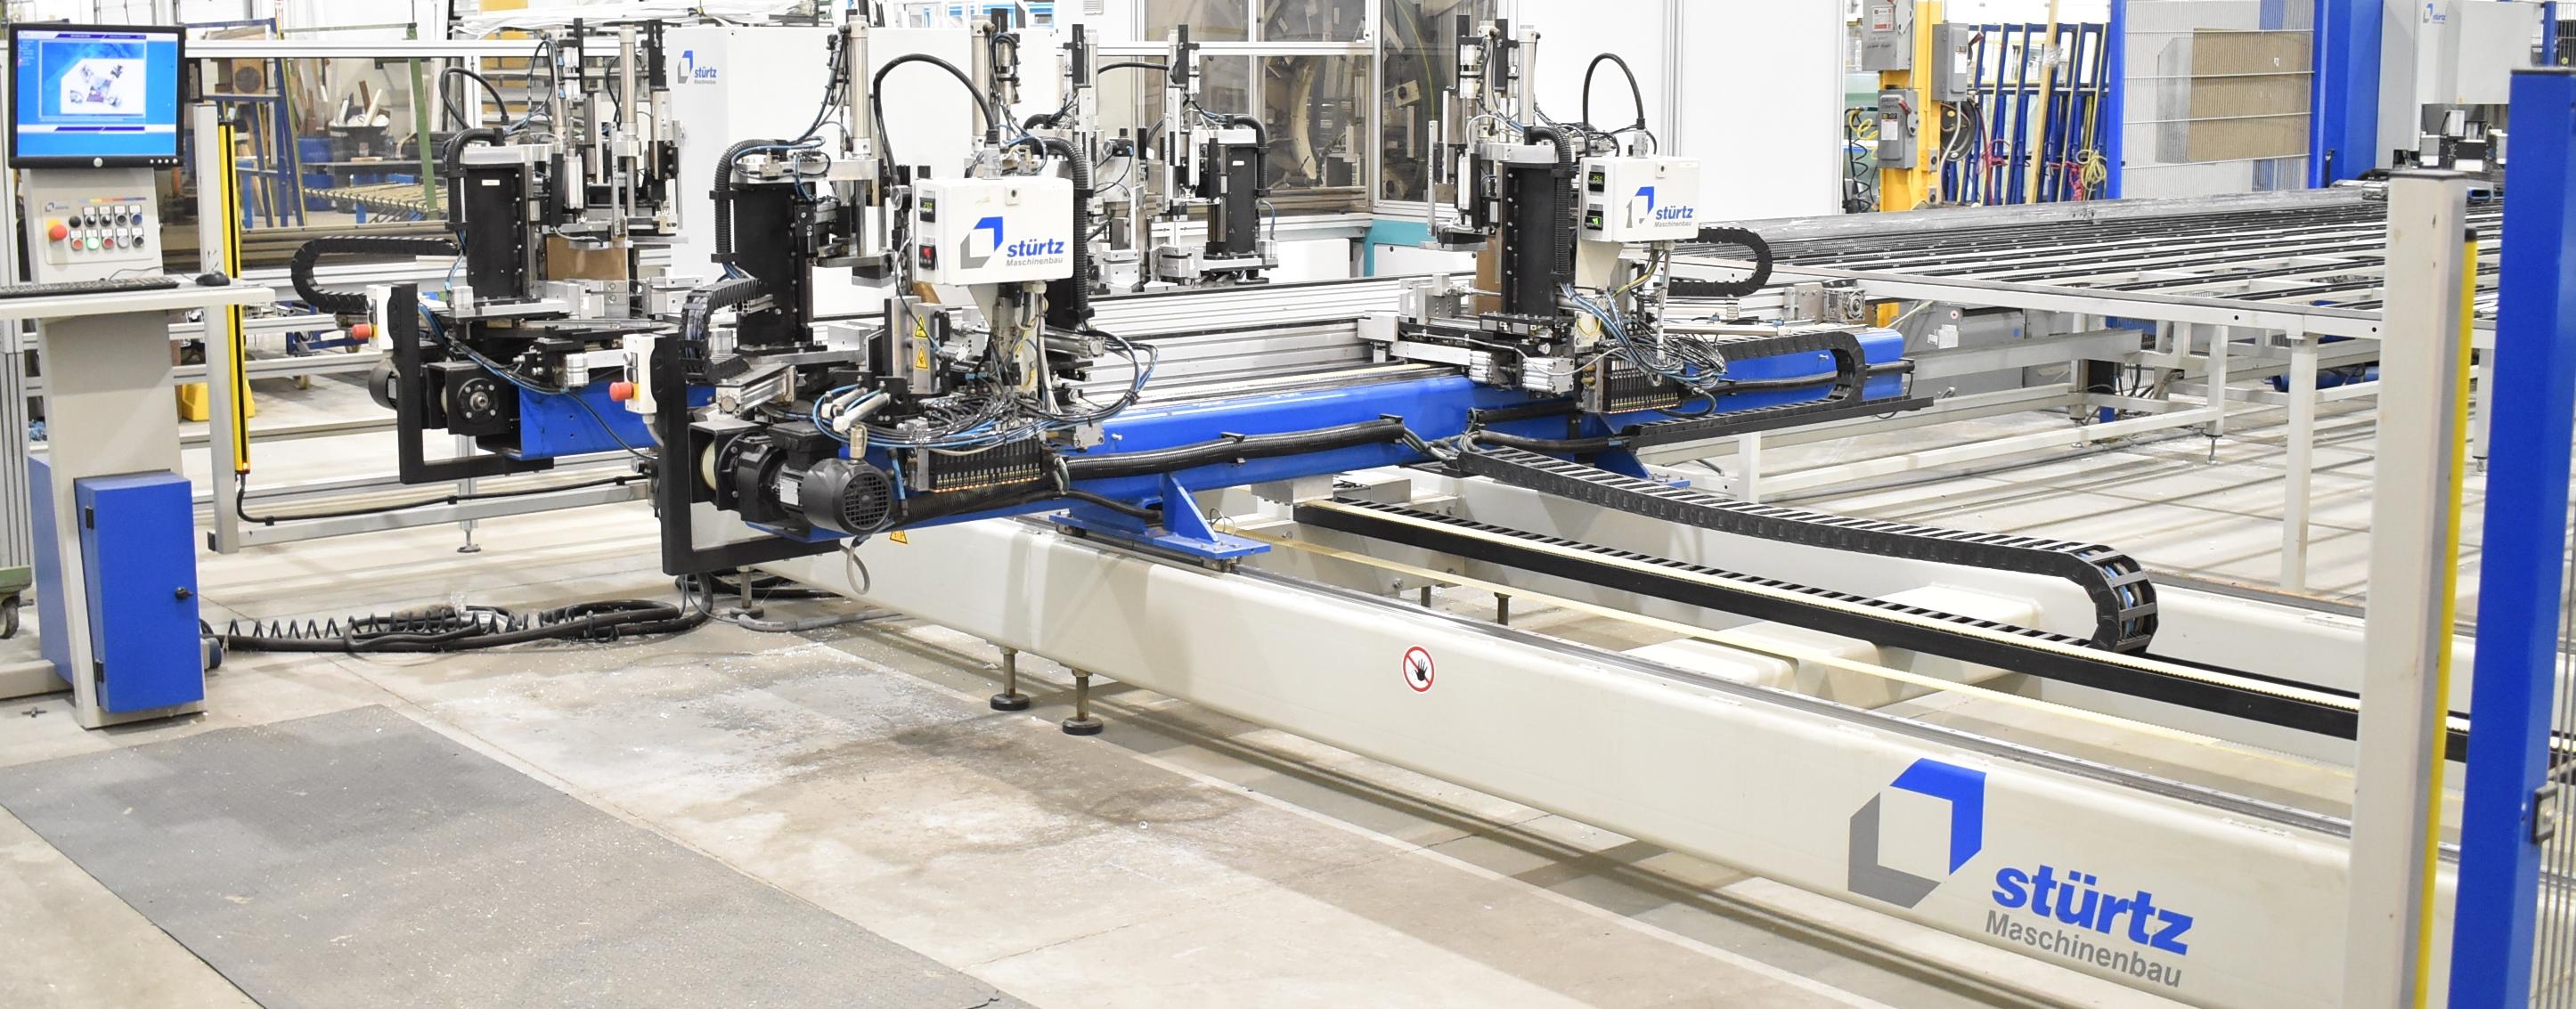 STURTZ (2008) CNC AUTOMATED PVC WELDING AND CLEANING LINE CONSISTING OF, STURTZ (2008) 2MC CNC - Image 3 of 9